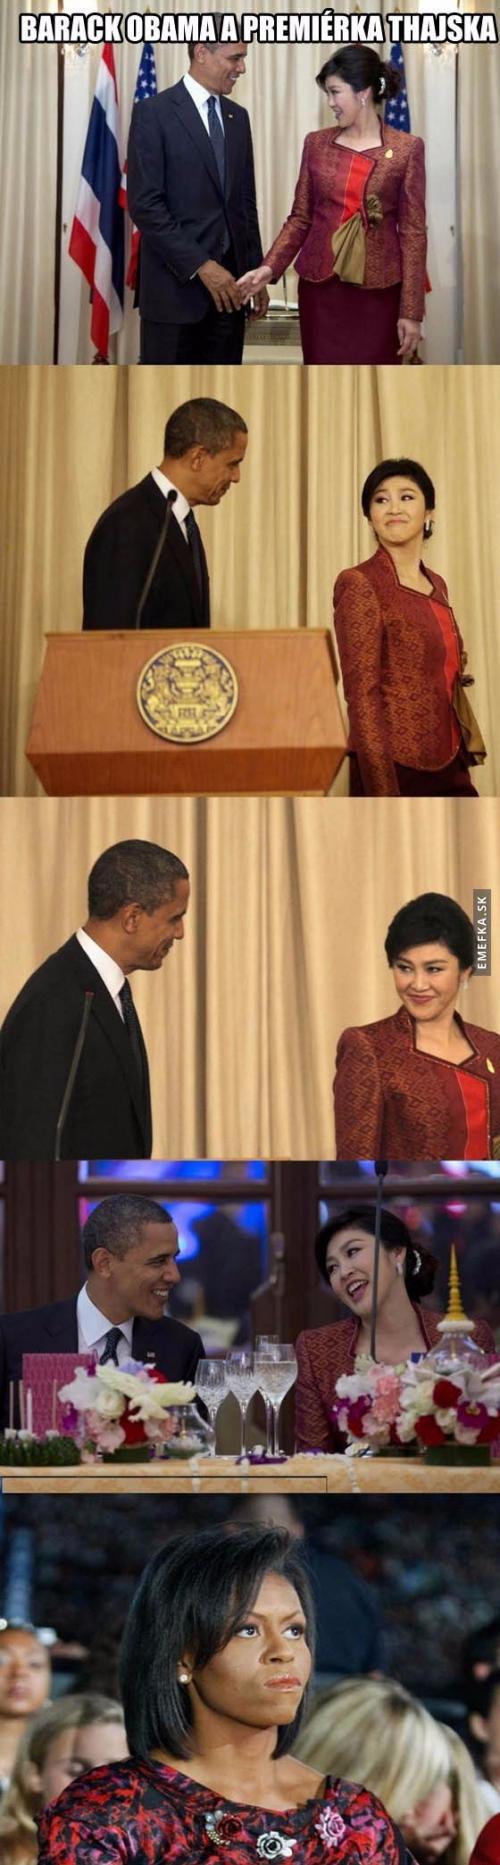 Barack Obama je kanec